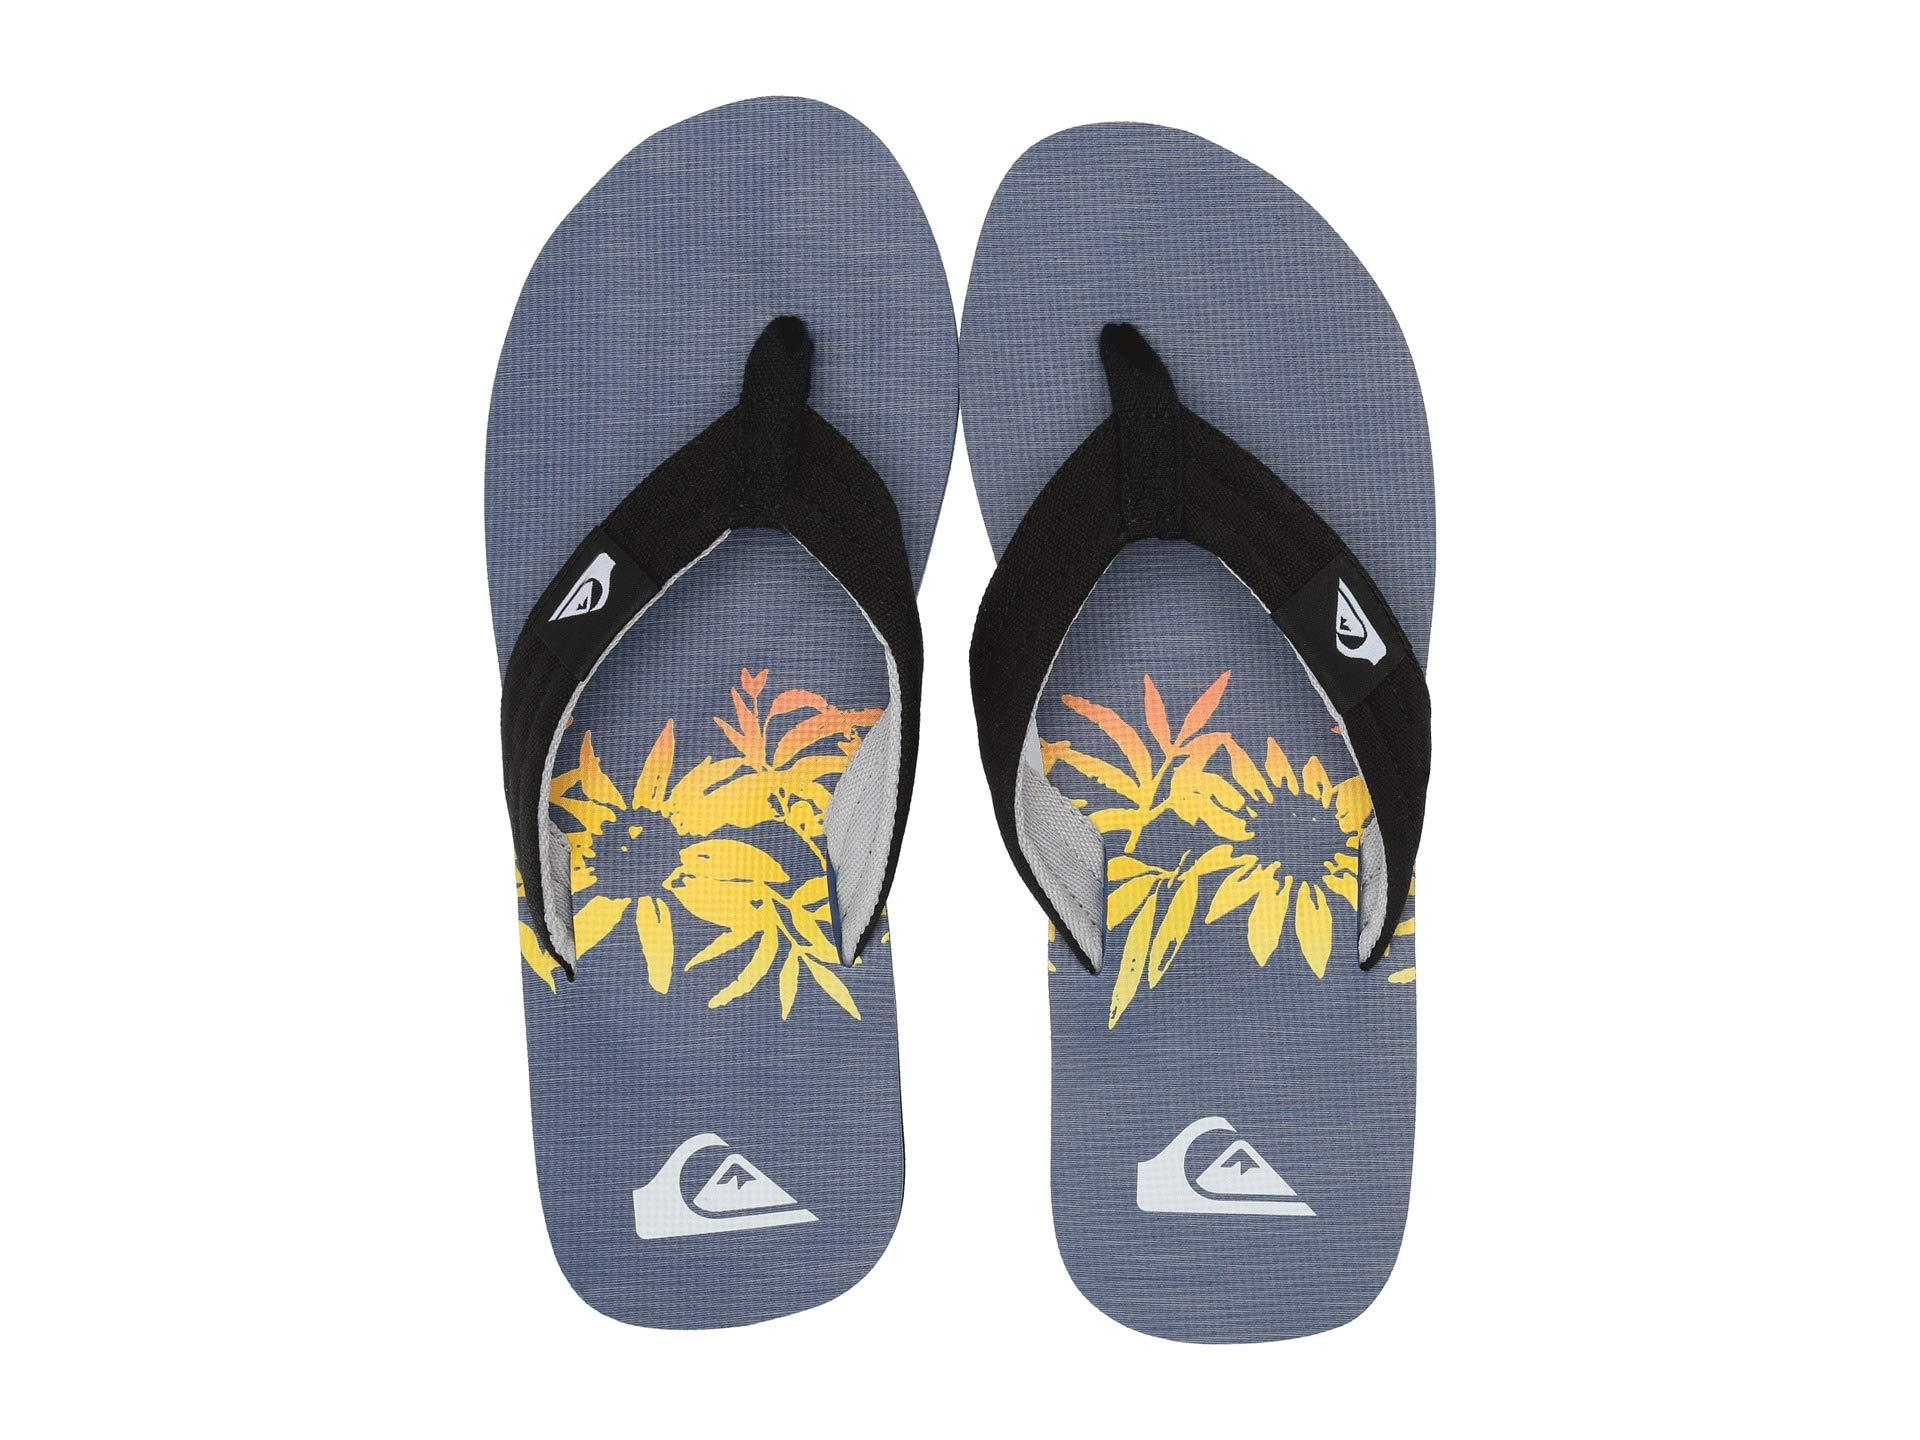 21604b7669d2 Lyst - Quiksilver Molokai Layback (blue black grey) Men s Sandals in ...